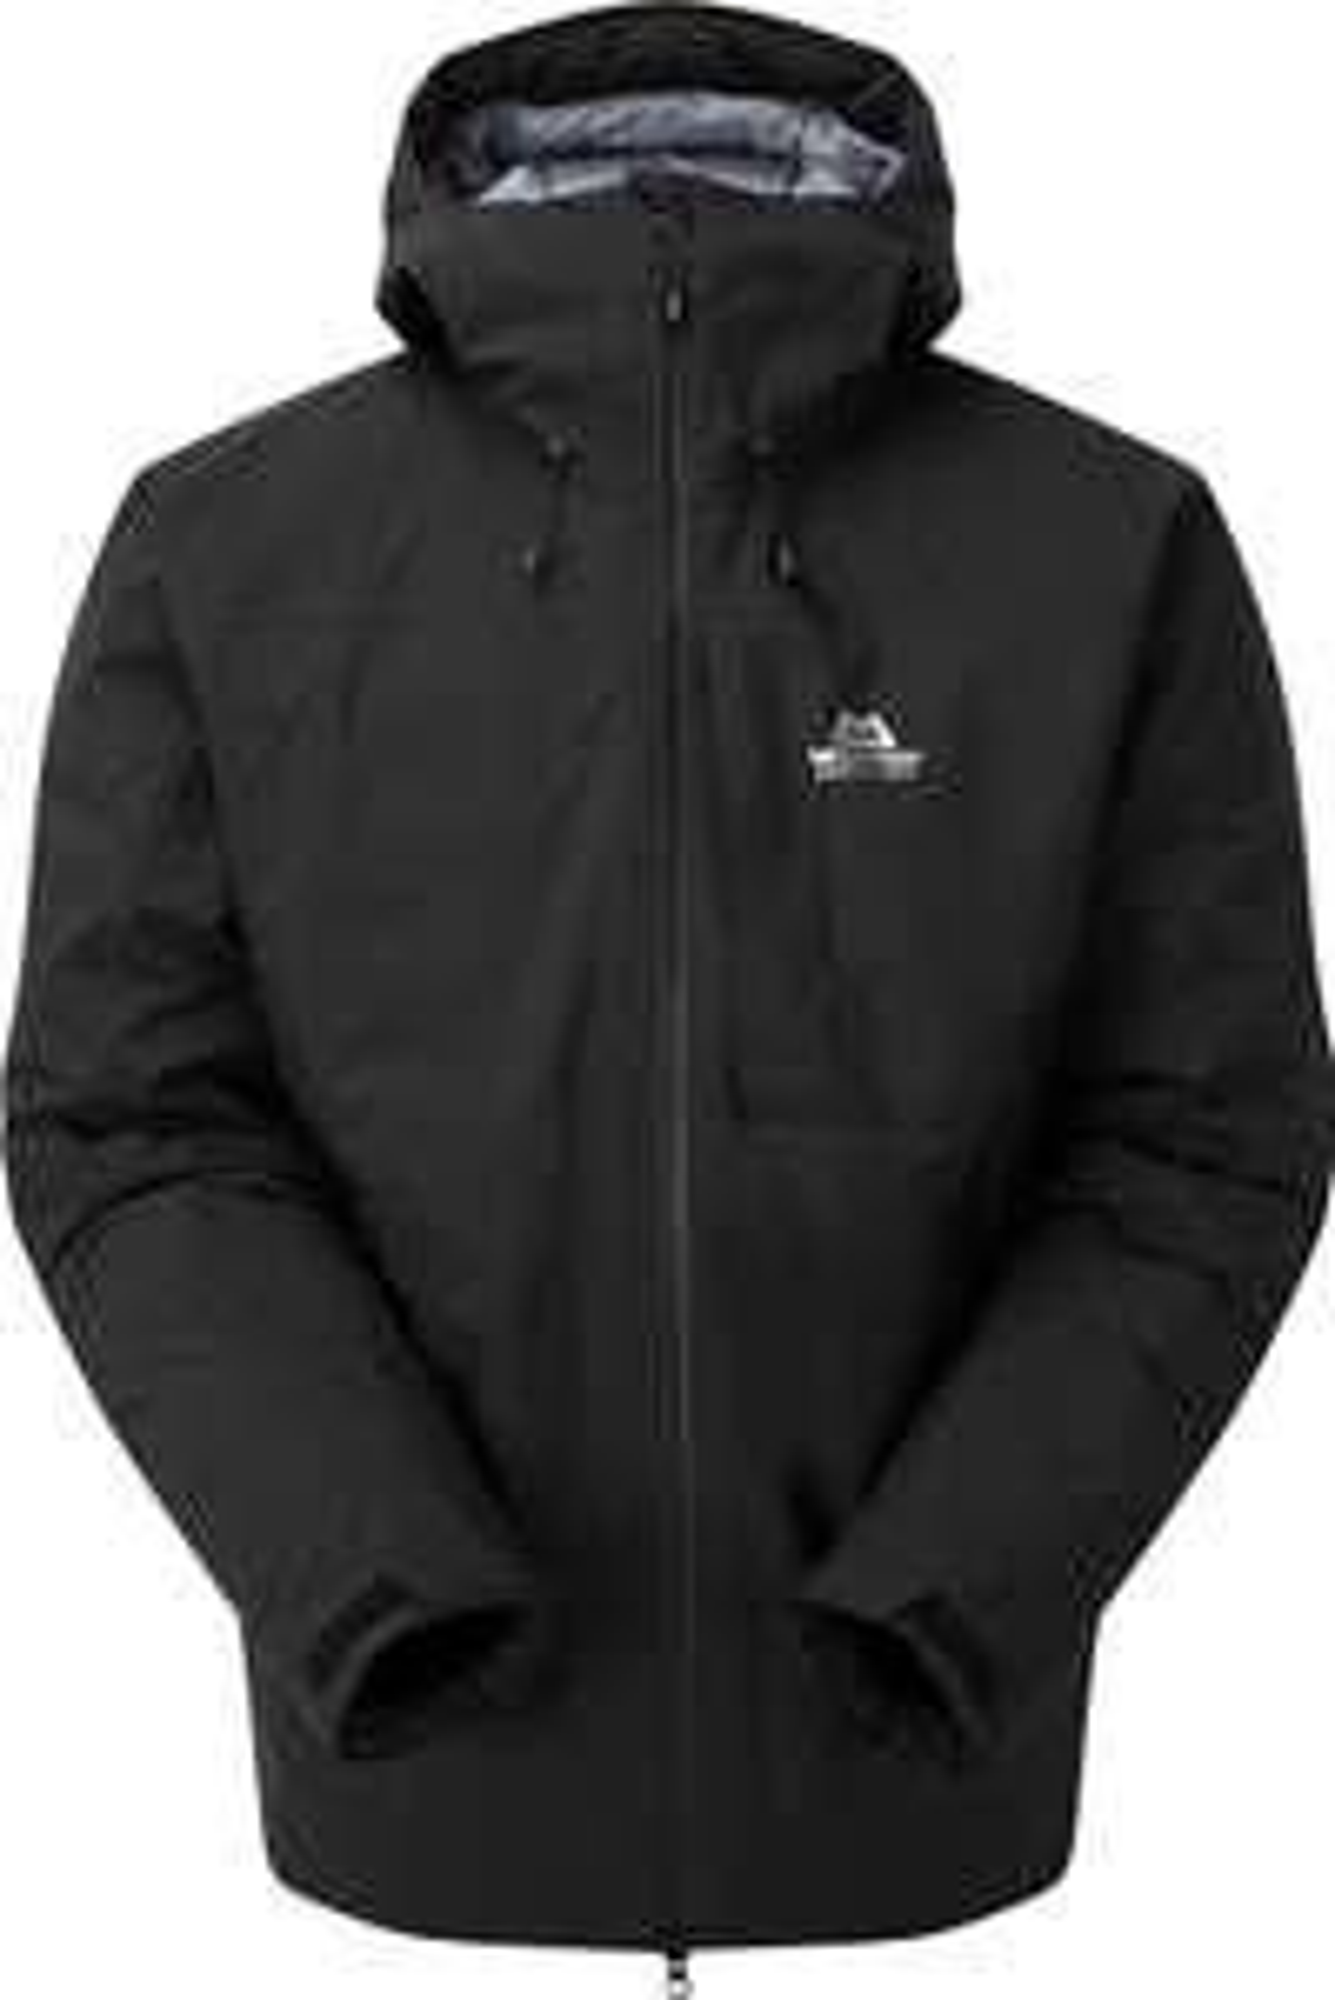 Men's Mountain Equipment Triton waterproof down jacket - Black - Taunton Leisure - £203